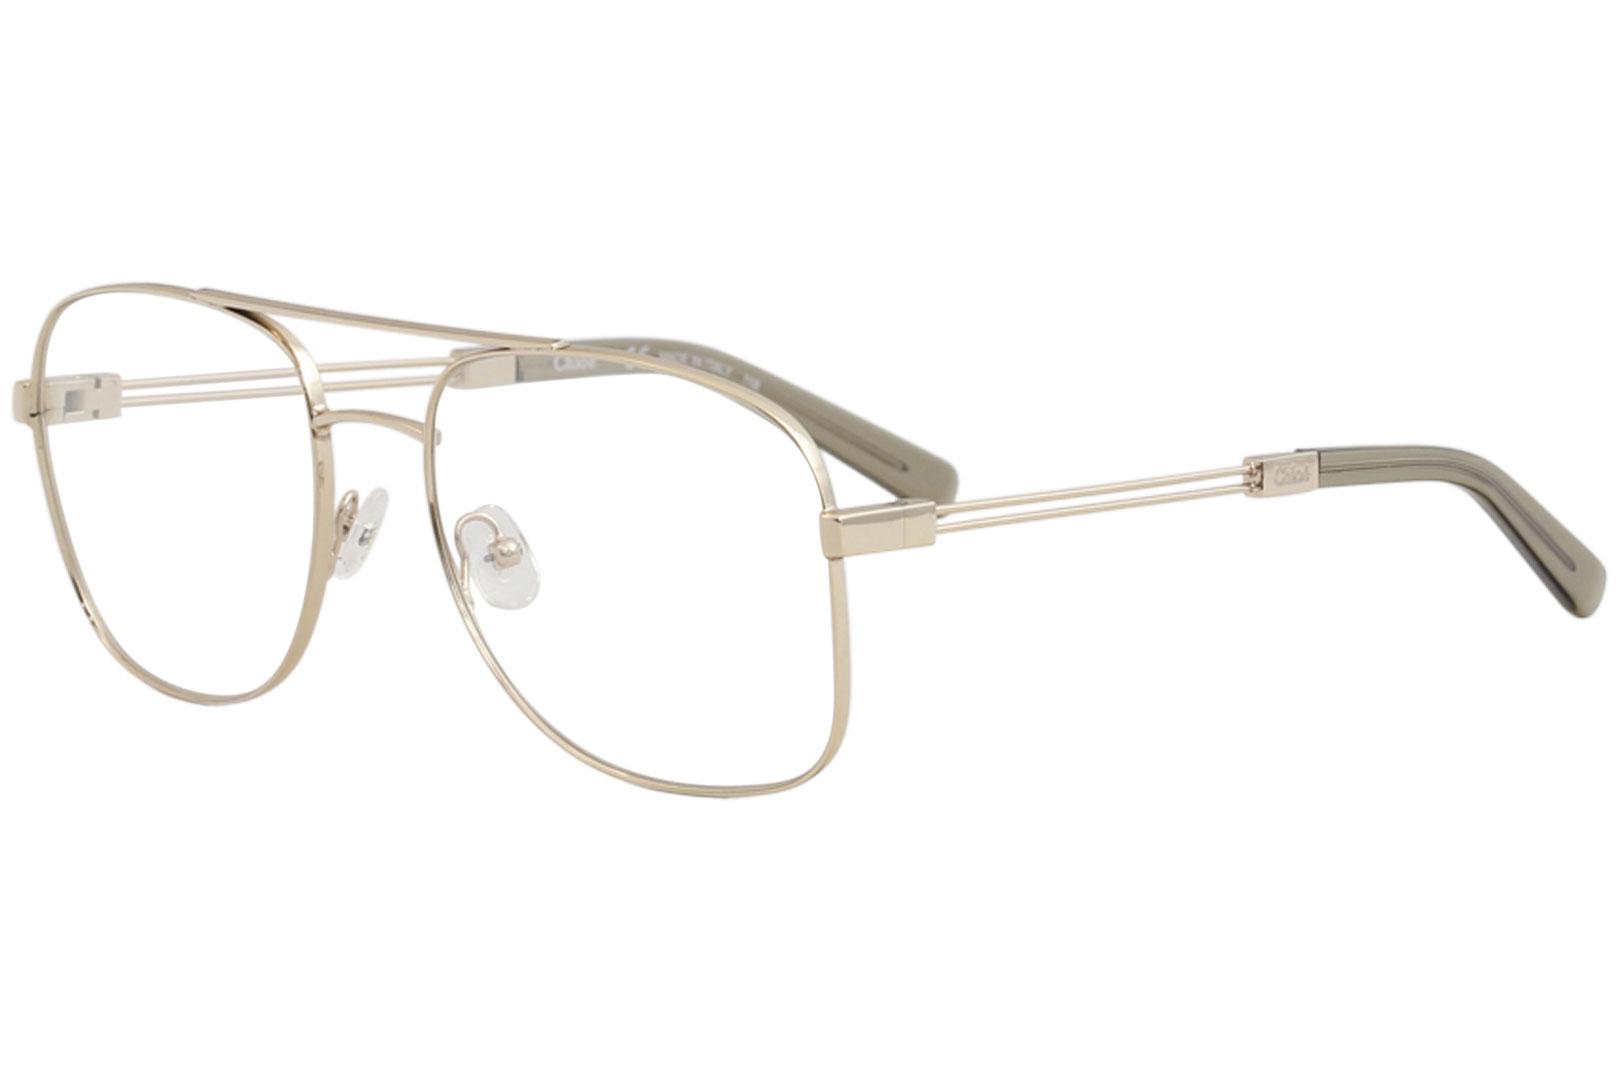 e1d474f9cce Chloe Eyeglasses CE2133 CE 2133 788 Rose Gold Turtledove Optical ...